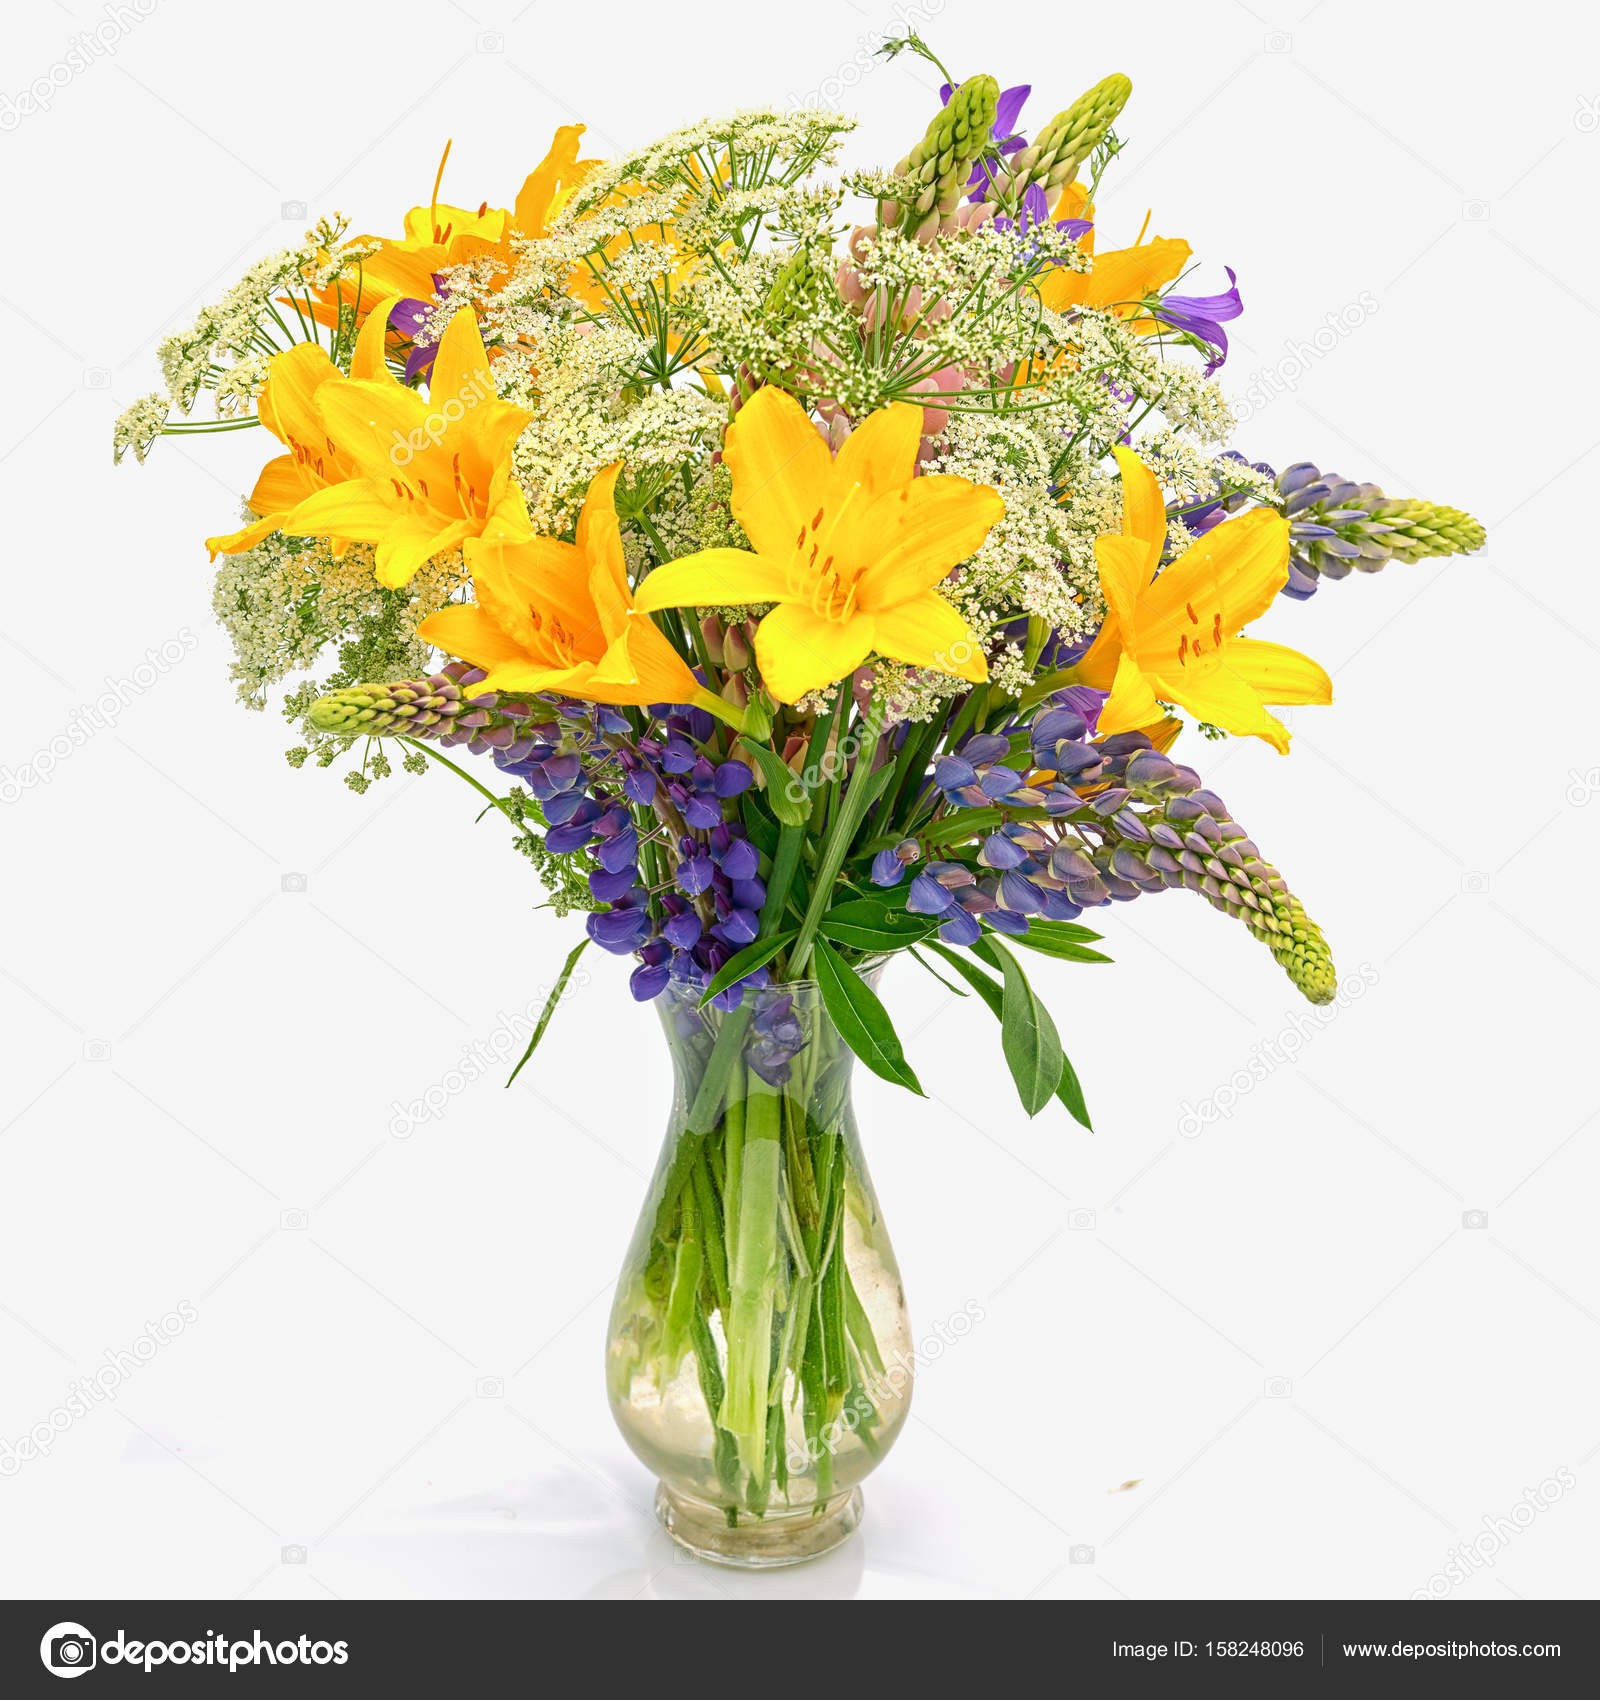 Beautiful Lilies Bouquet In A Vase Wallpapers Inspirational Bouquet Od Wild Flowers Achillea Millefolium Day Lily